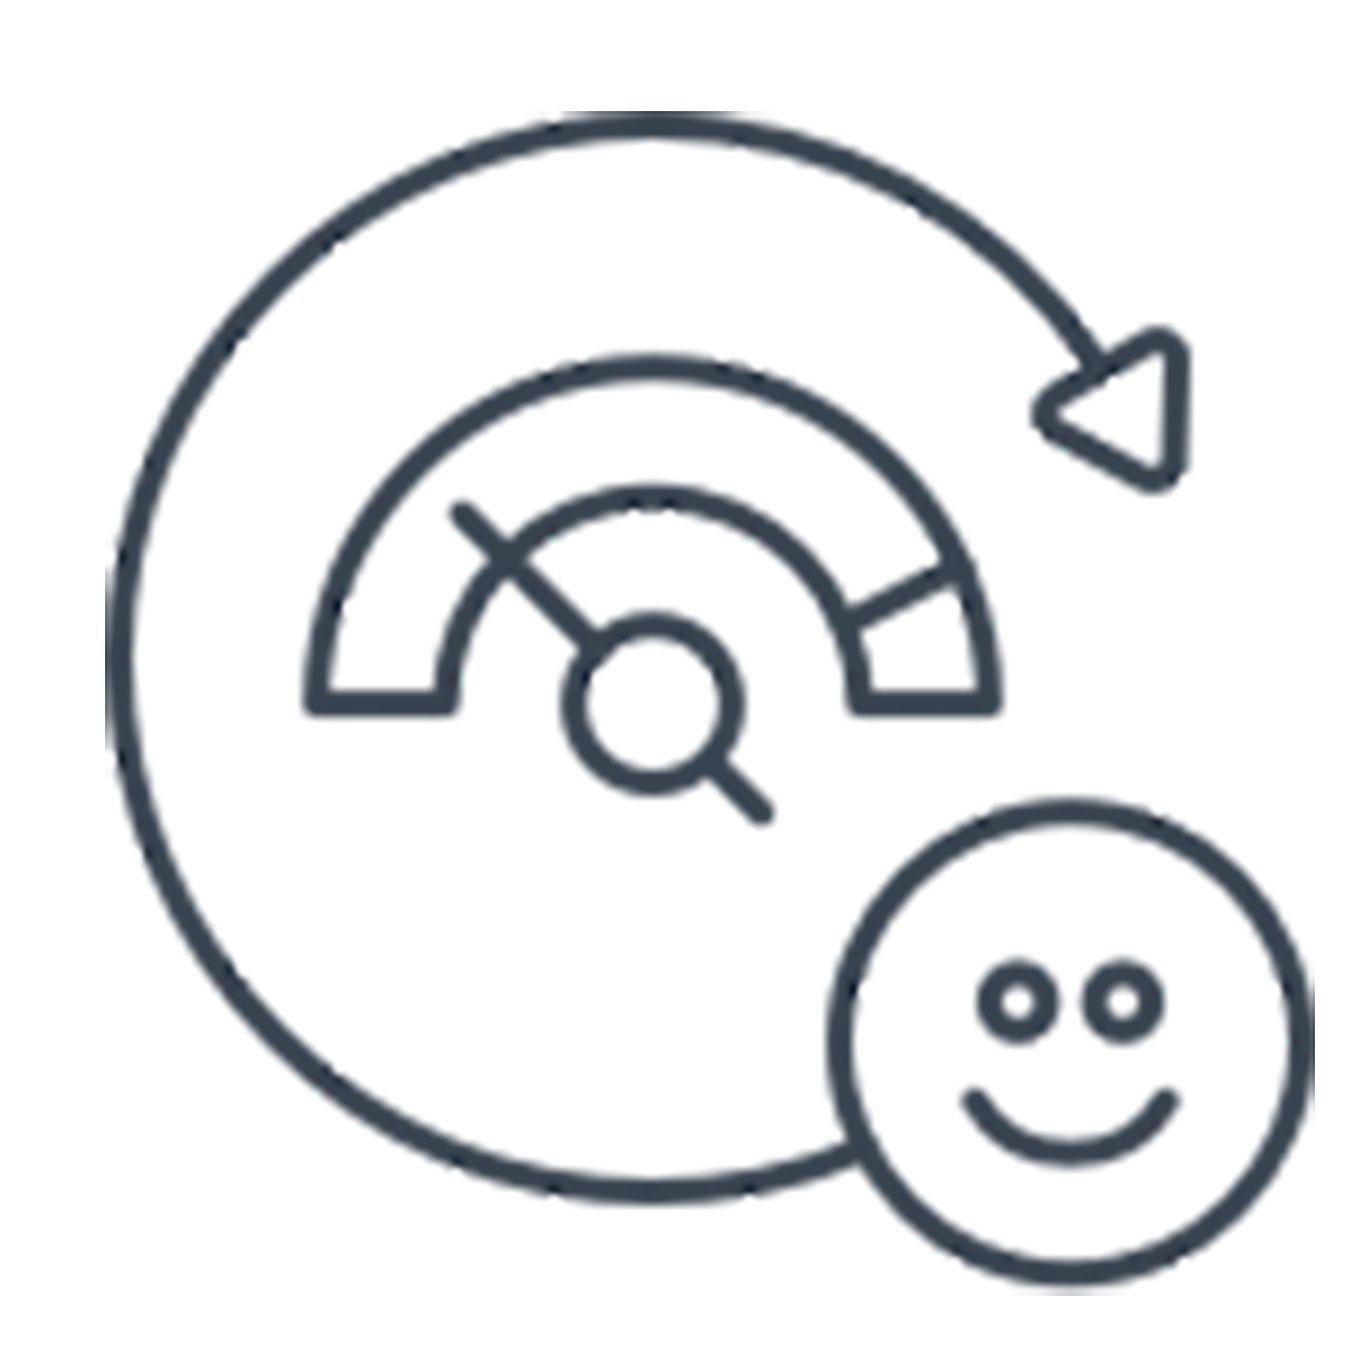 Happiness indicator symbol